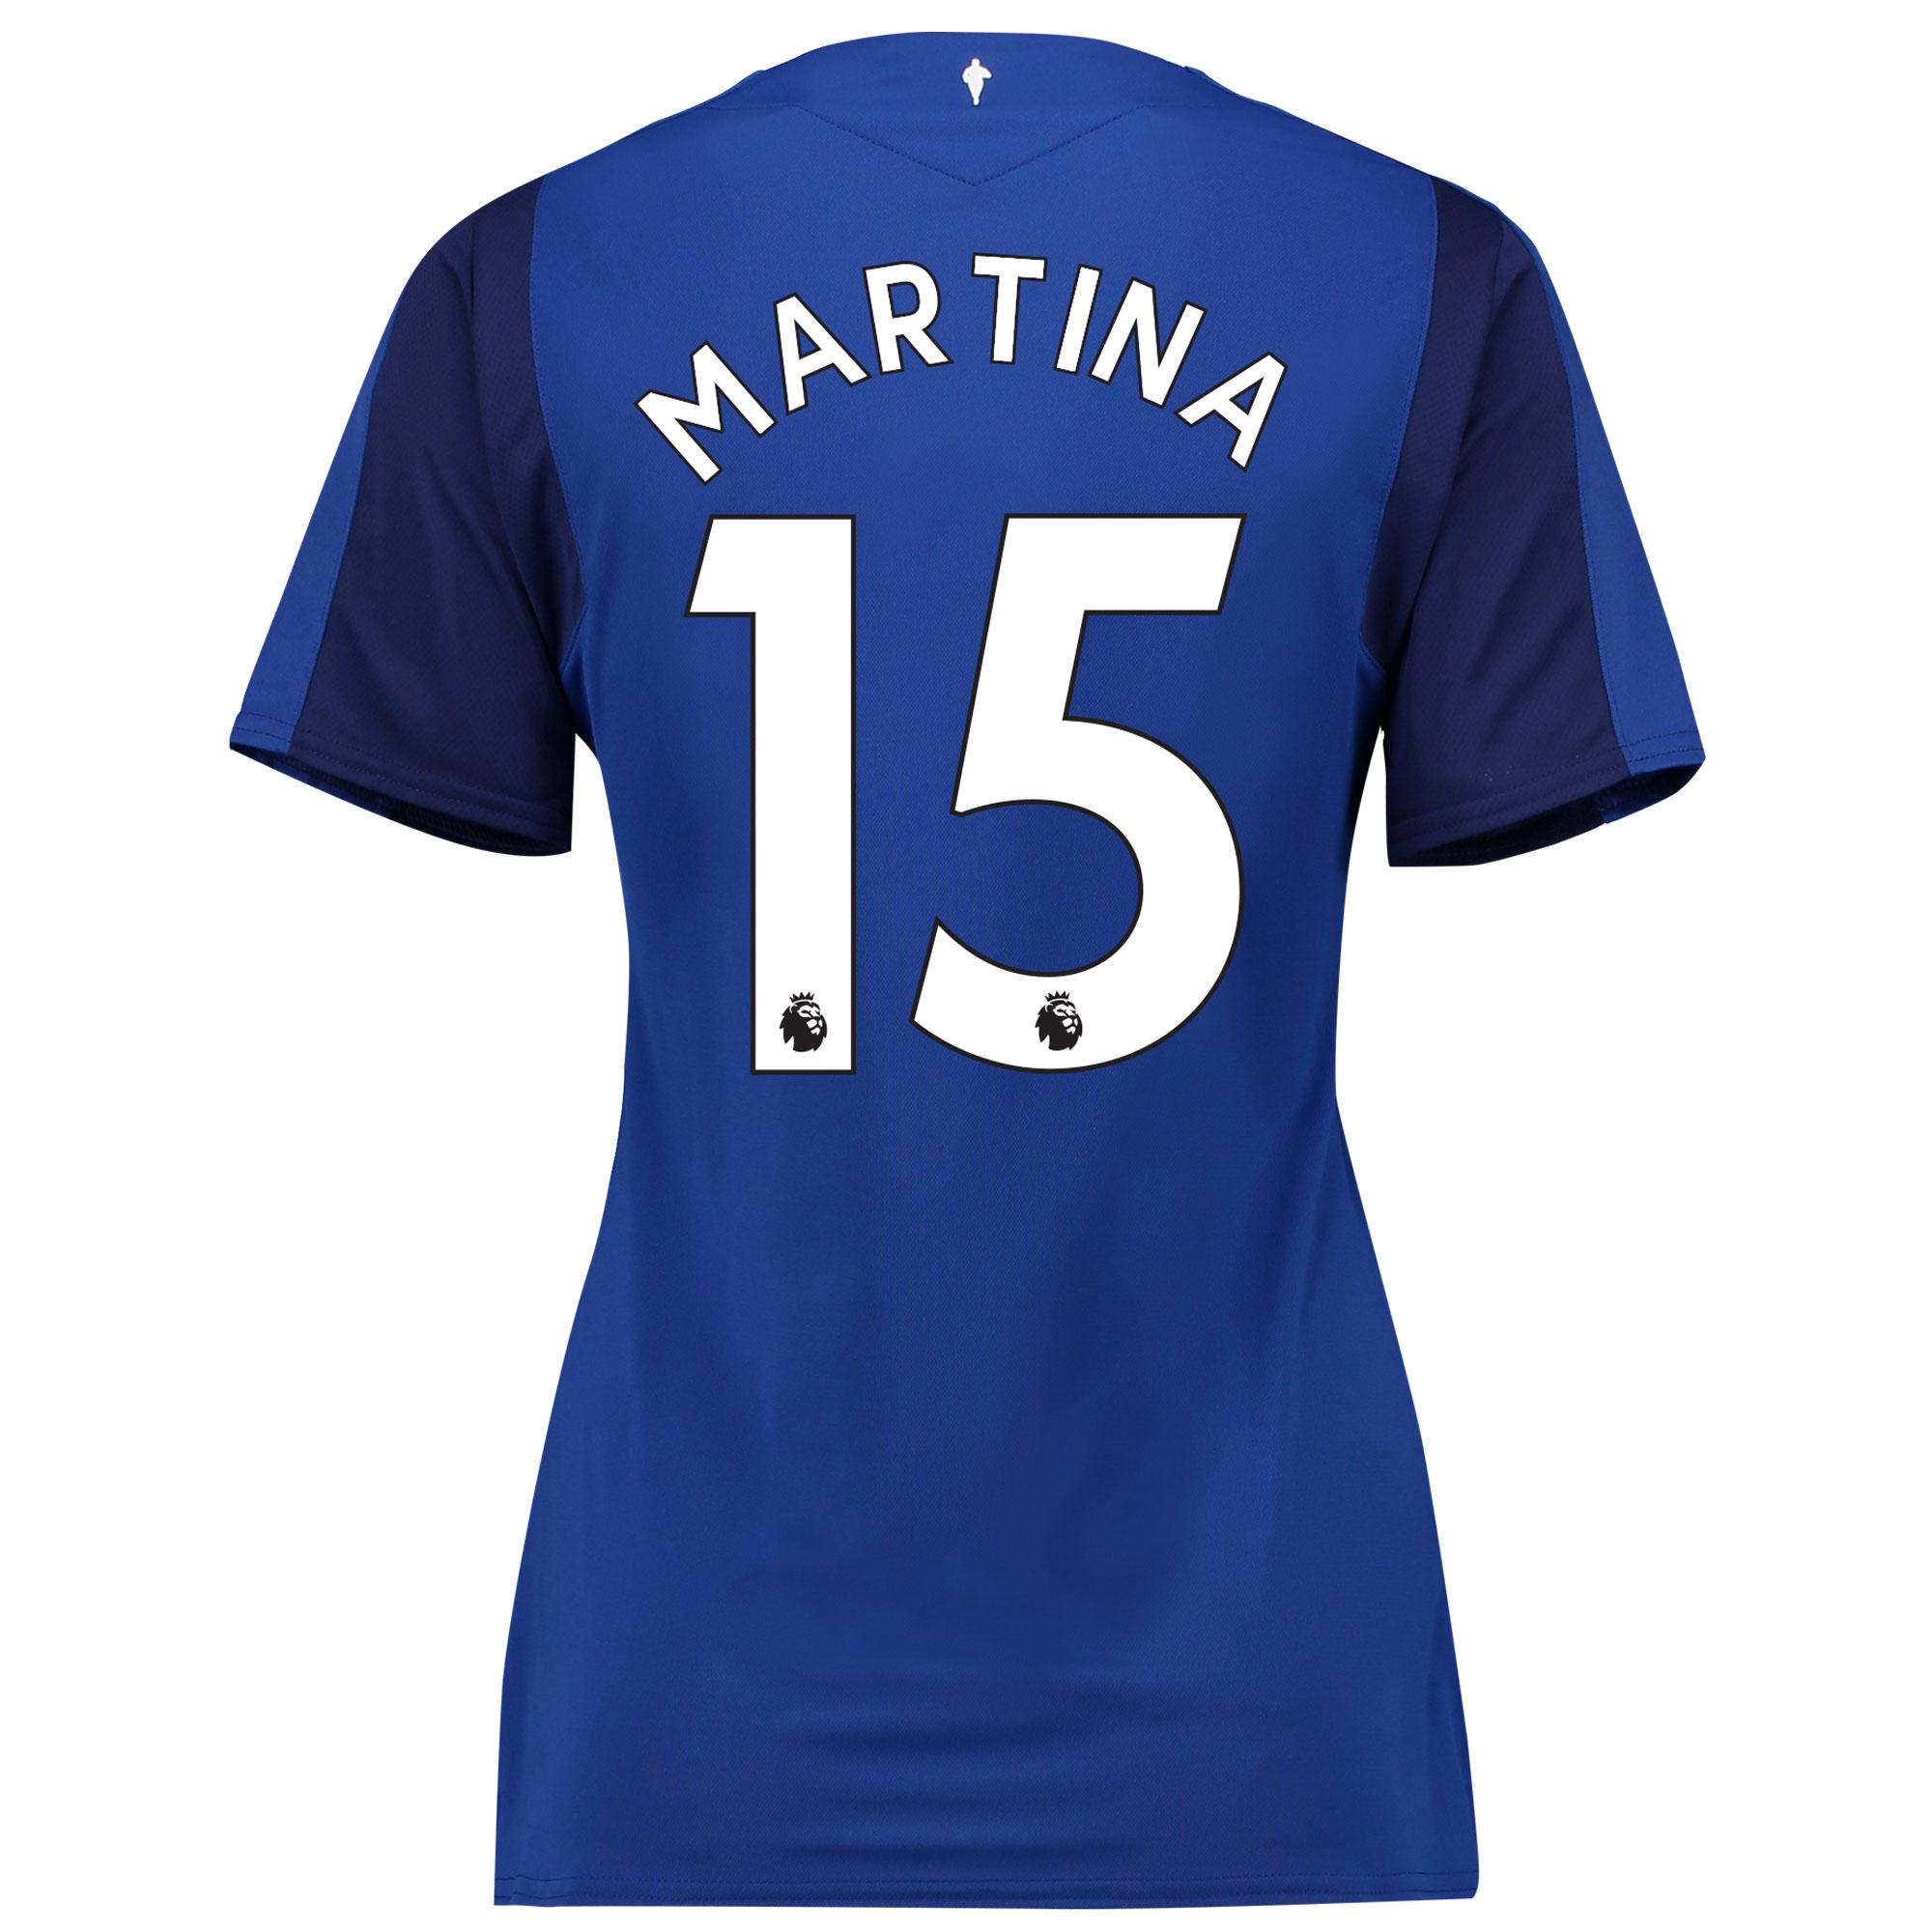 Everton Home Shirt 2017/18 - Womens with Martina 15 printing